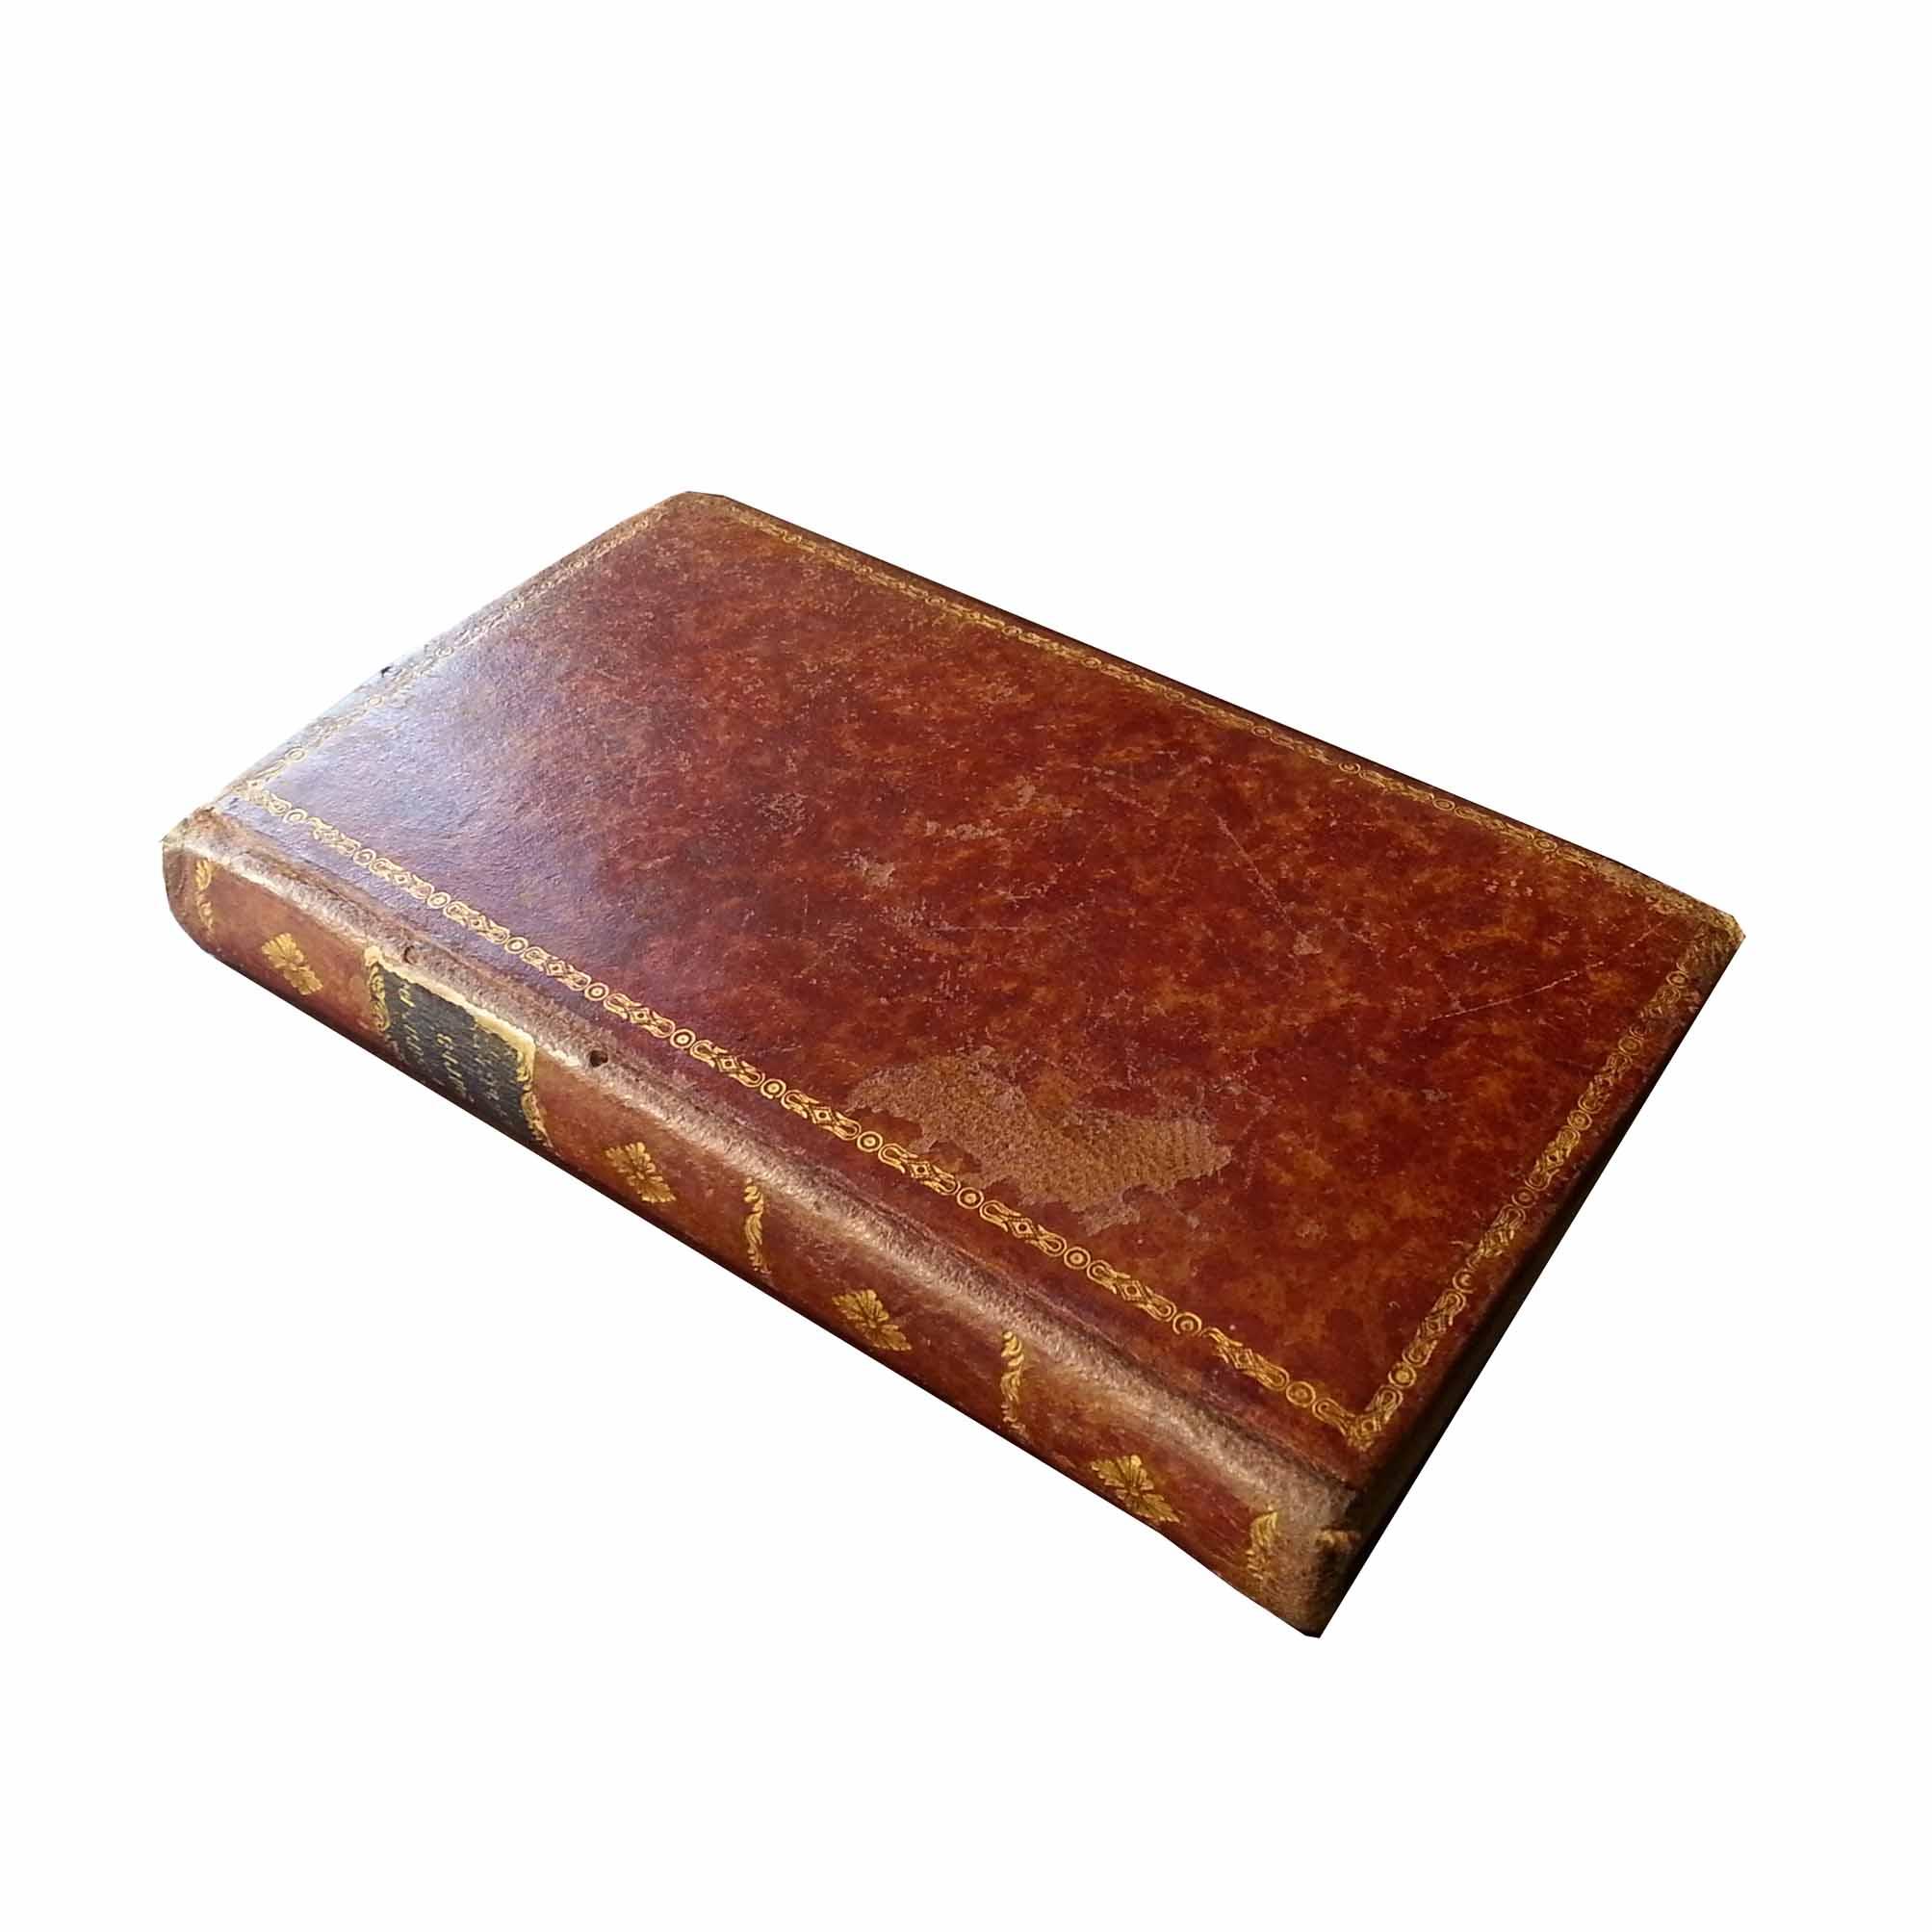 5024-Setean-Bible-History-1848-Calf-Binding-Front-Spine-free-N.jpg